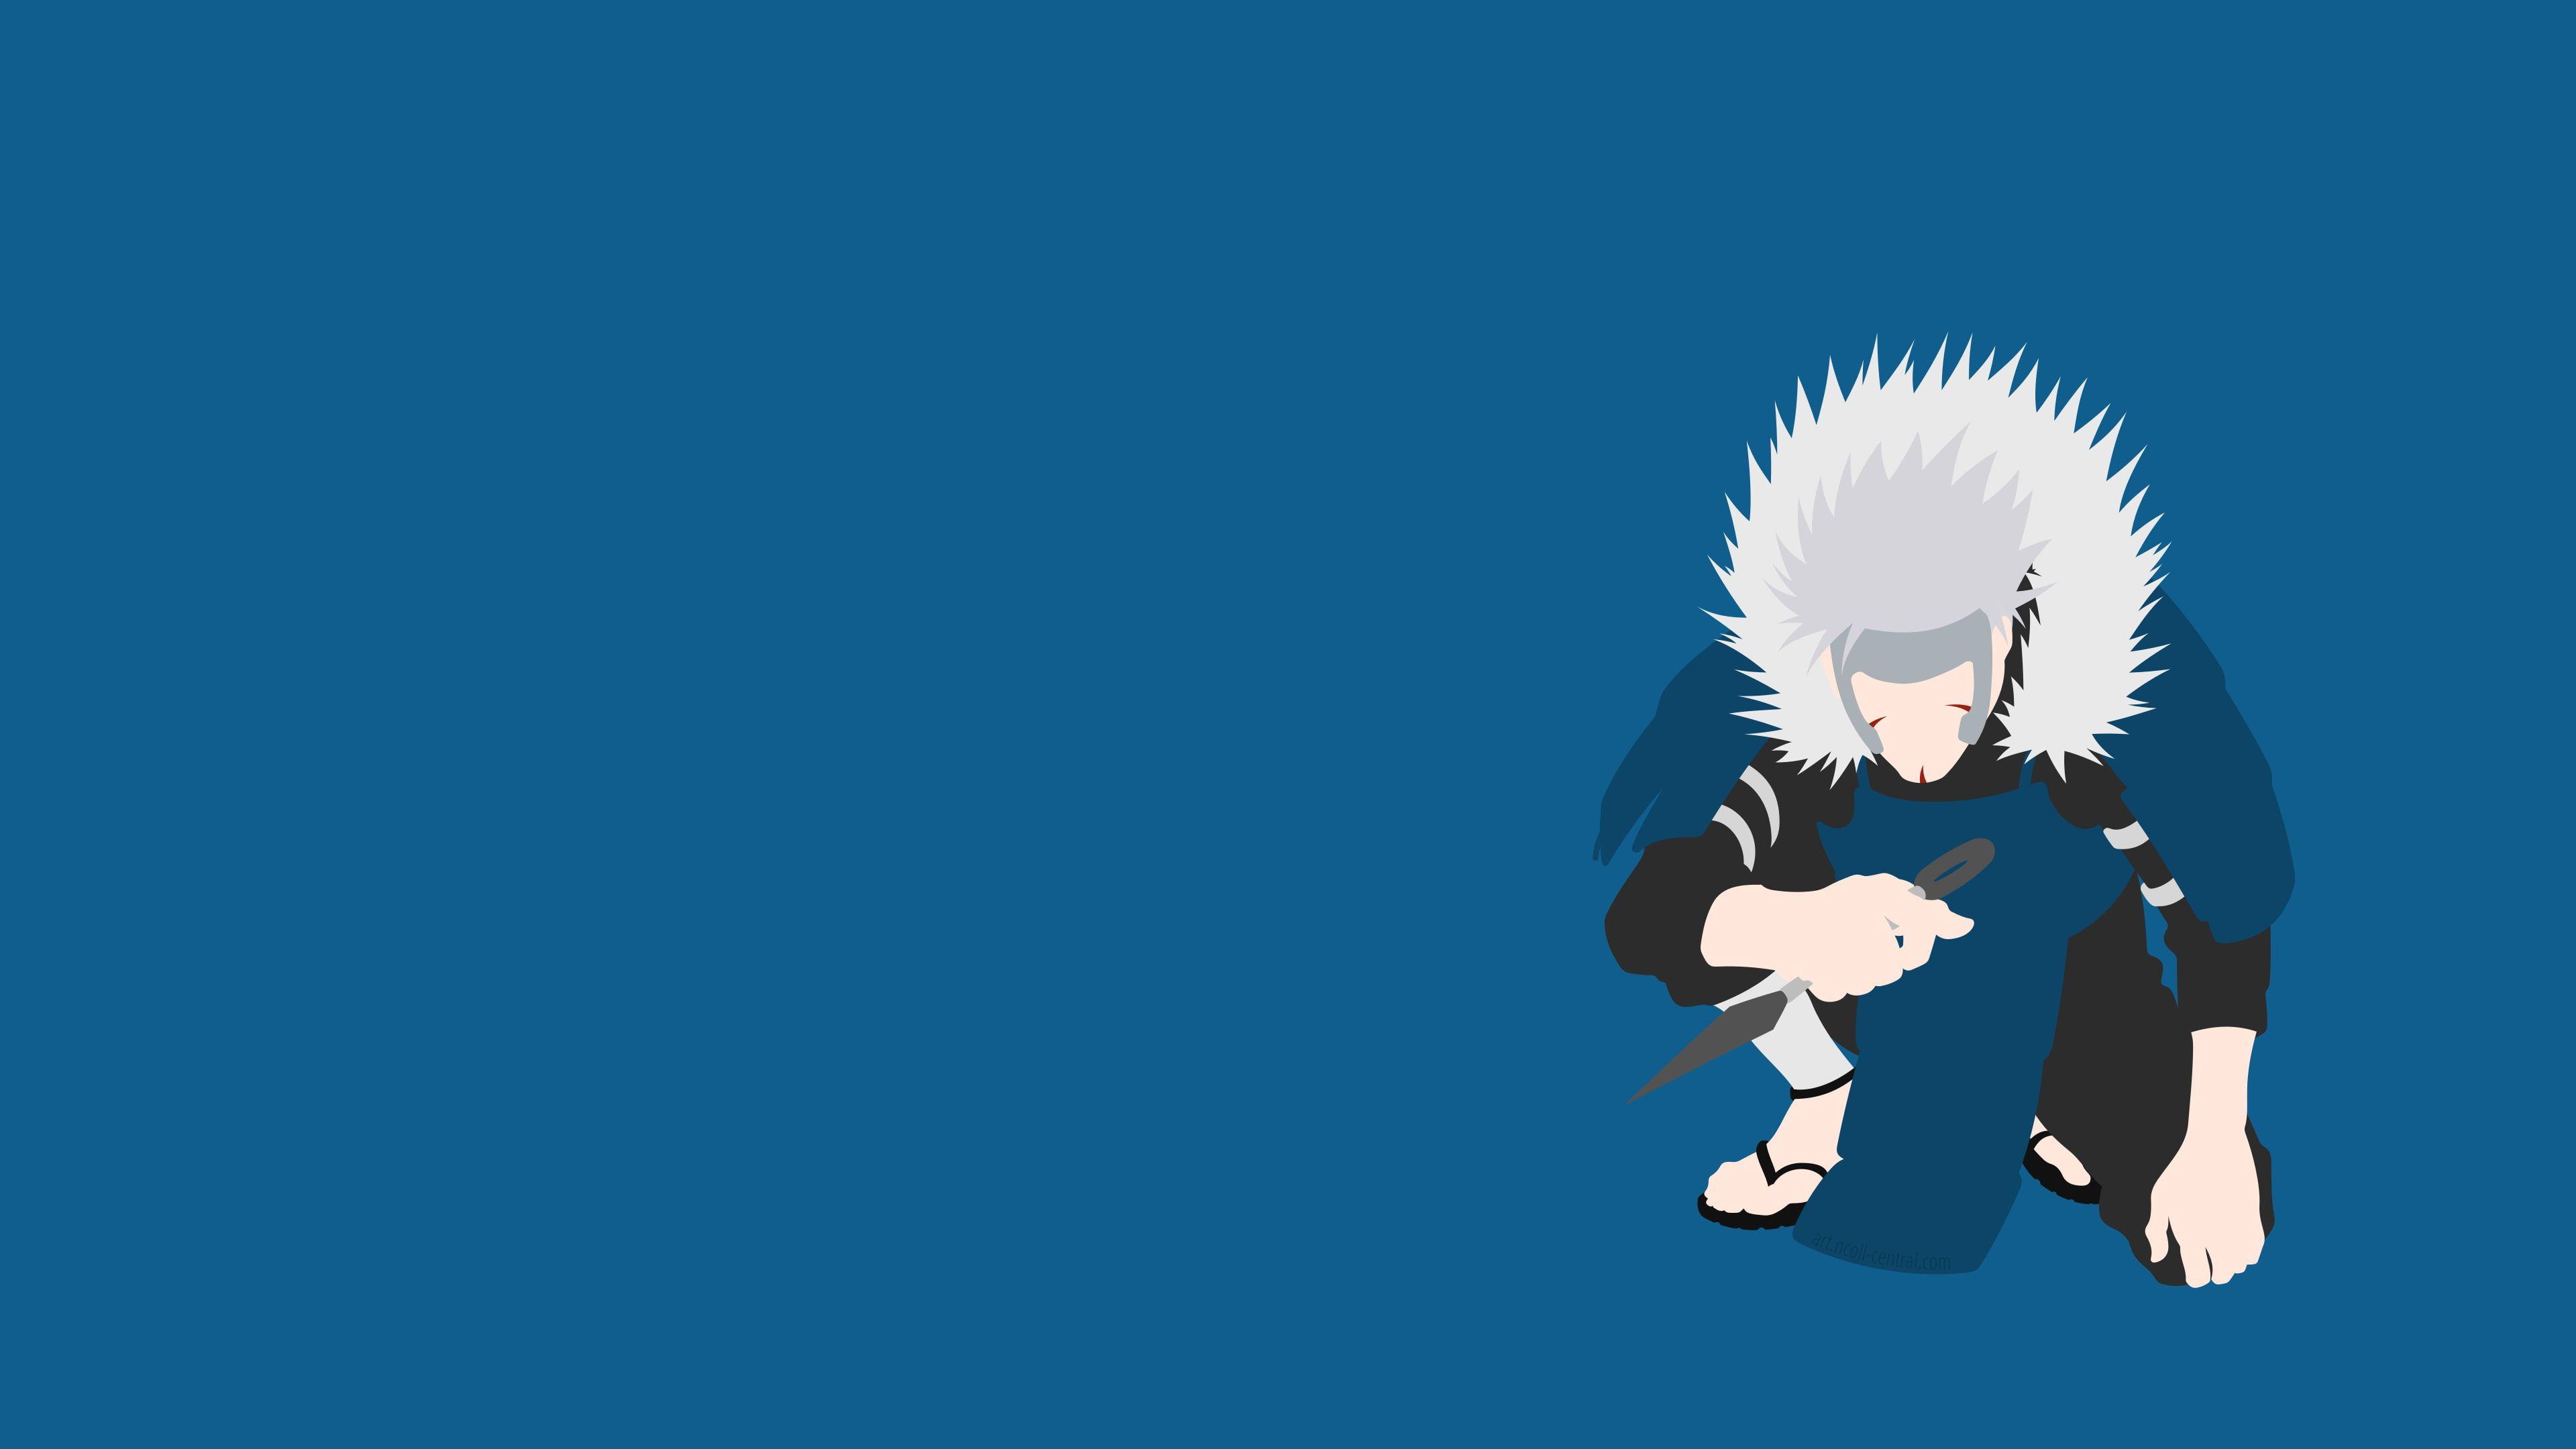 Anime Naruto Tobirama Senju 4k Wallpaper Hdwallpaper Desktop Naruto Wallpaper Anime Anime Wallpaper Download Anime minimalist wallpaper 4k